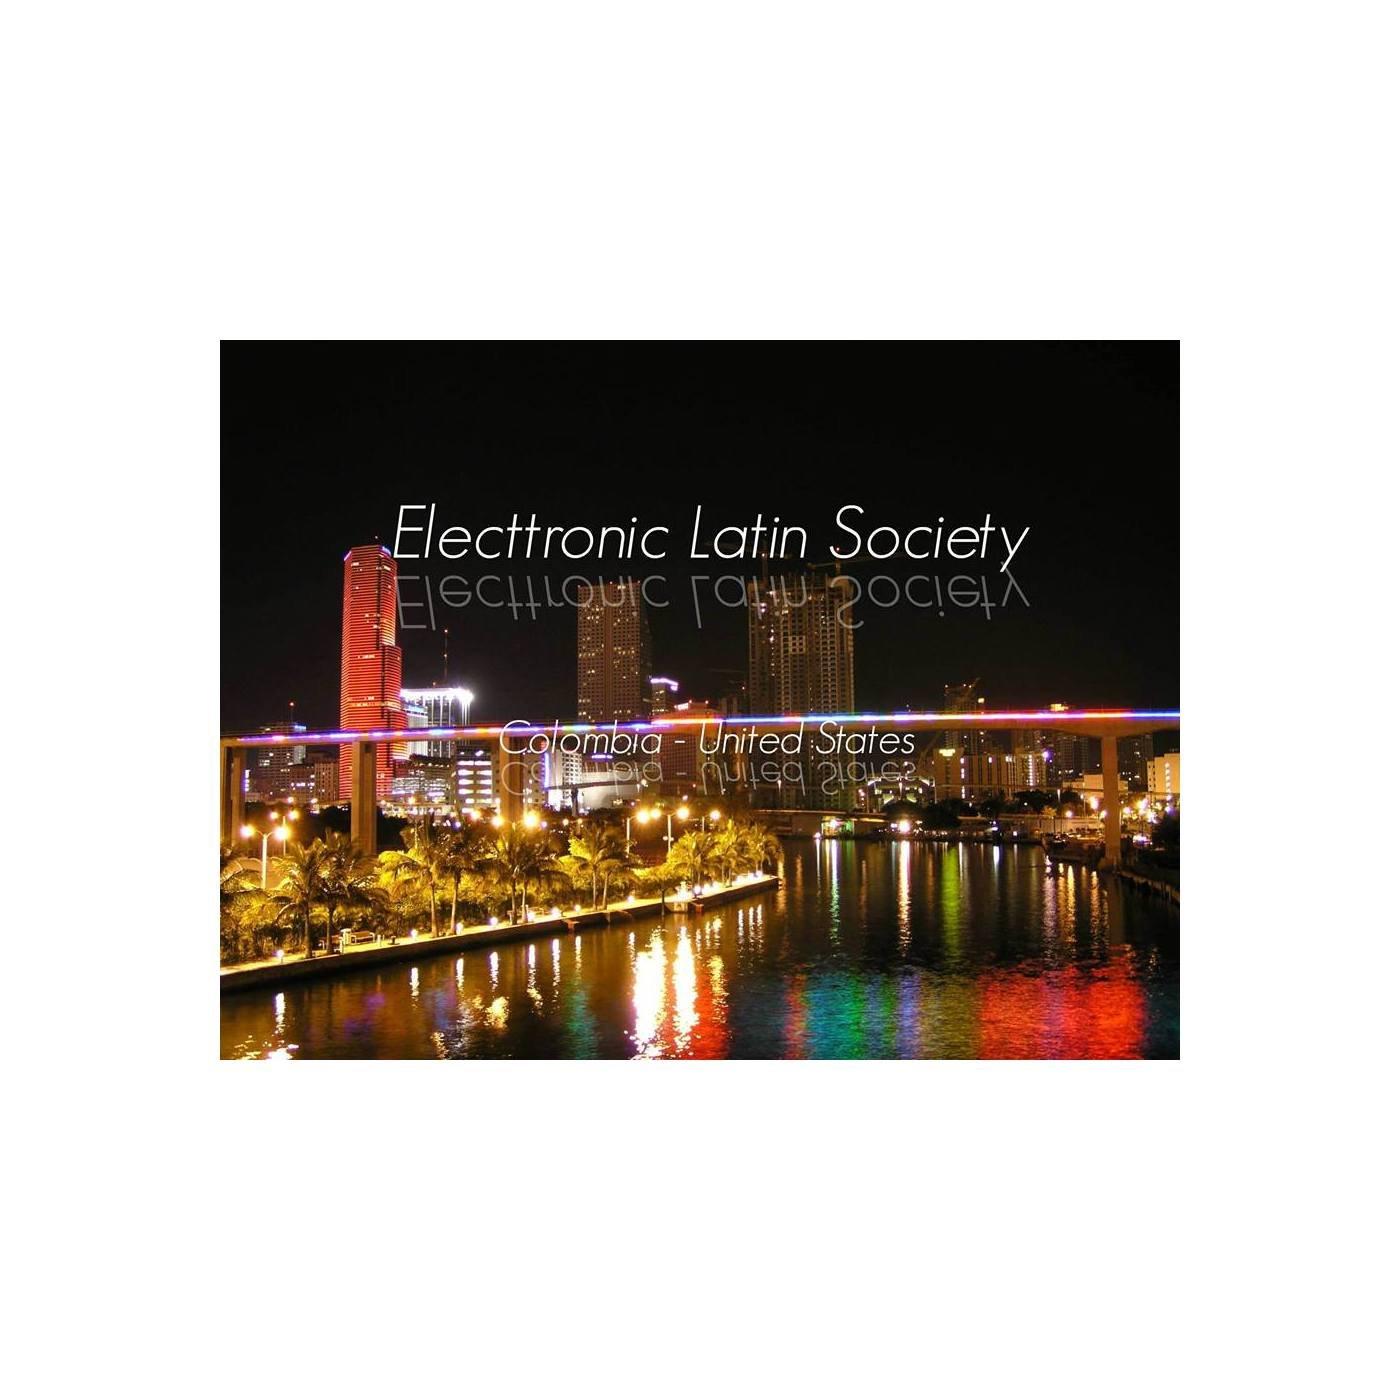 <![CDATA[Electtronic Latin Society ]]>